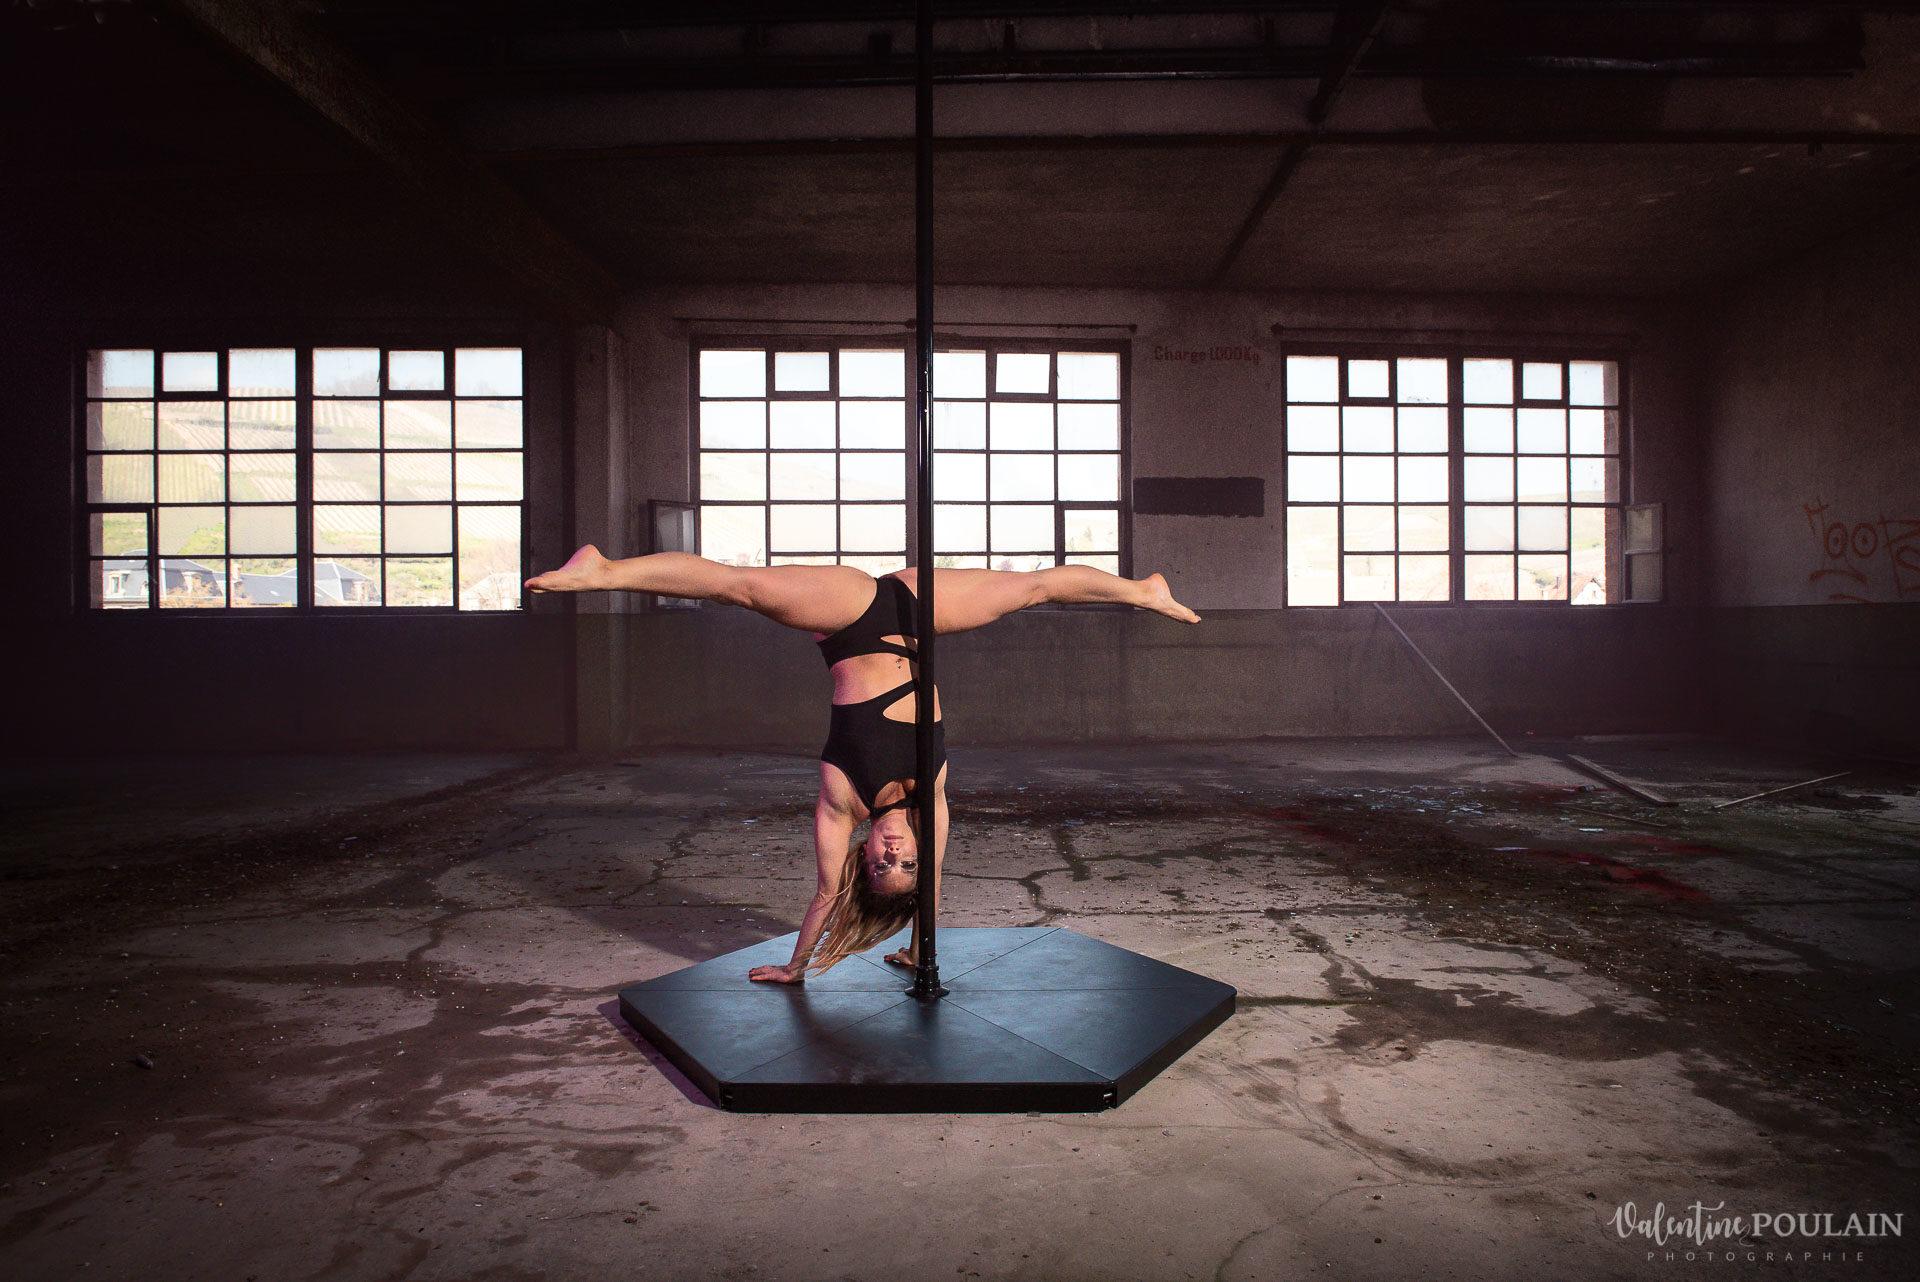 Shooting Pole Dance gymnastique - Valentine Poulain handstand